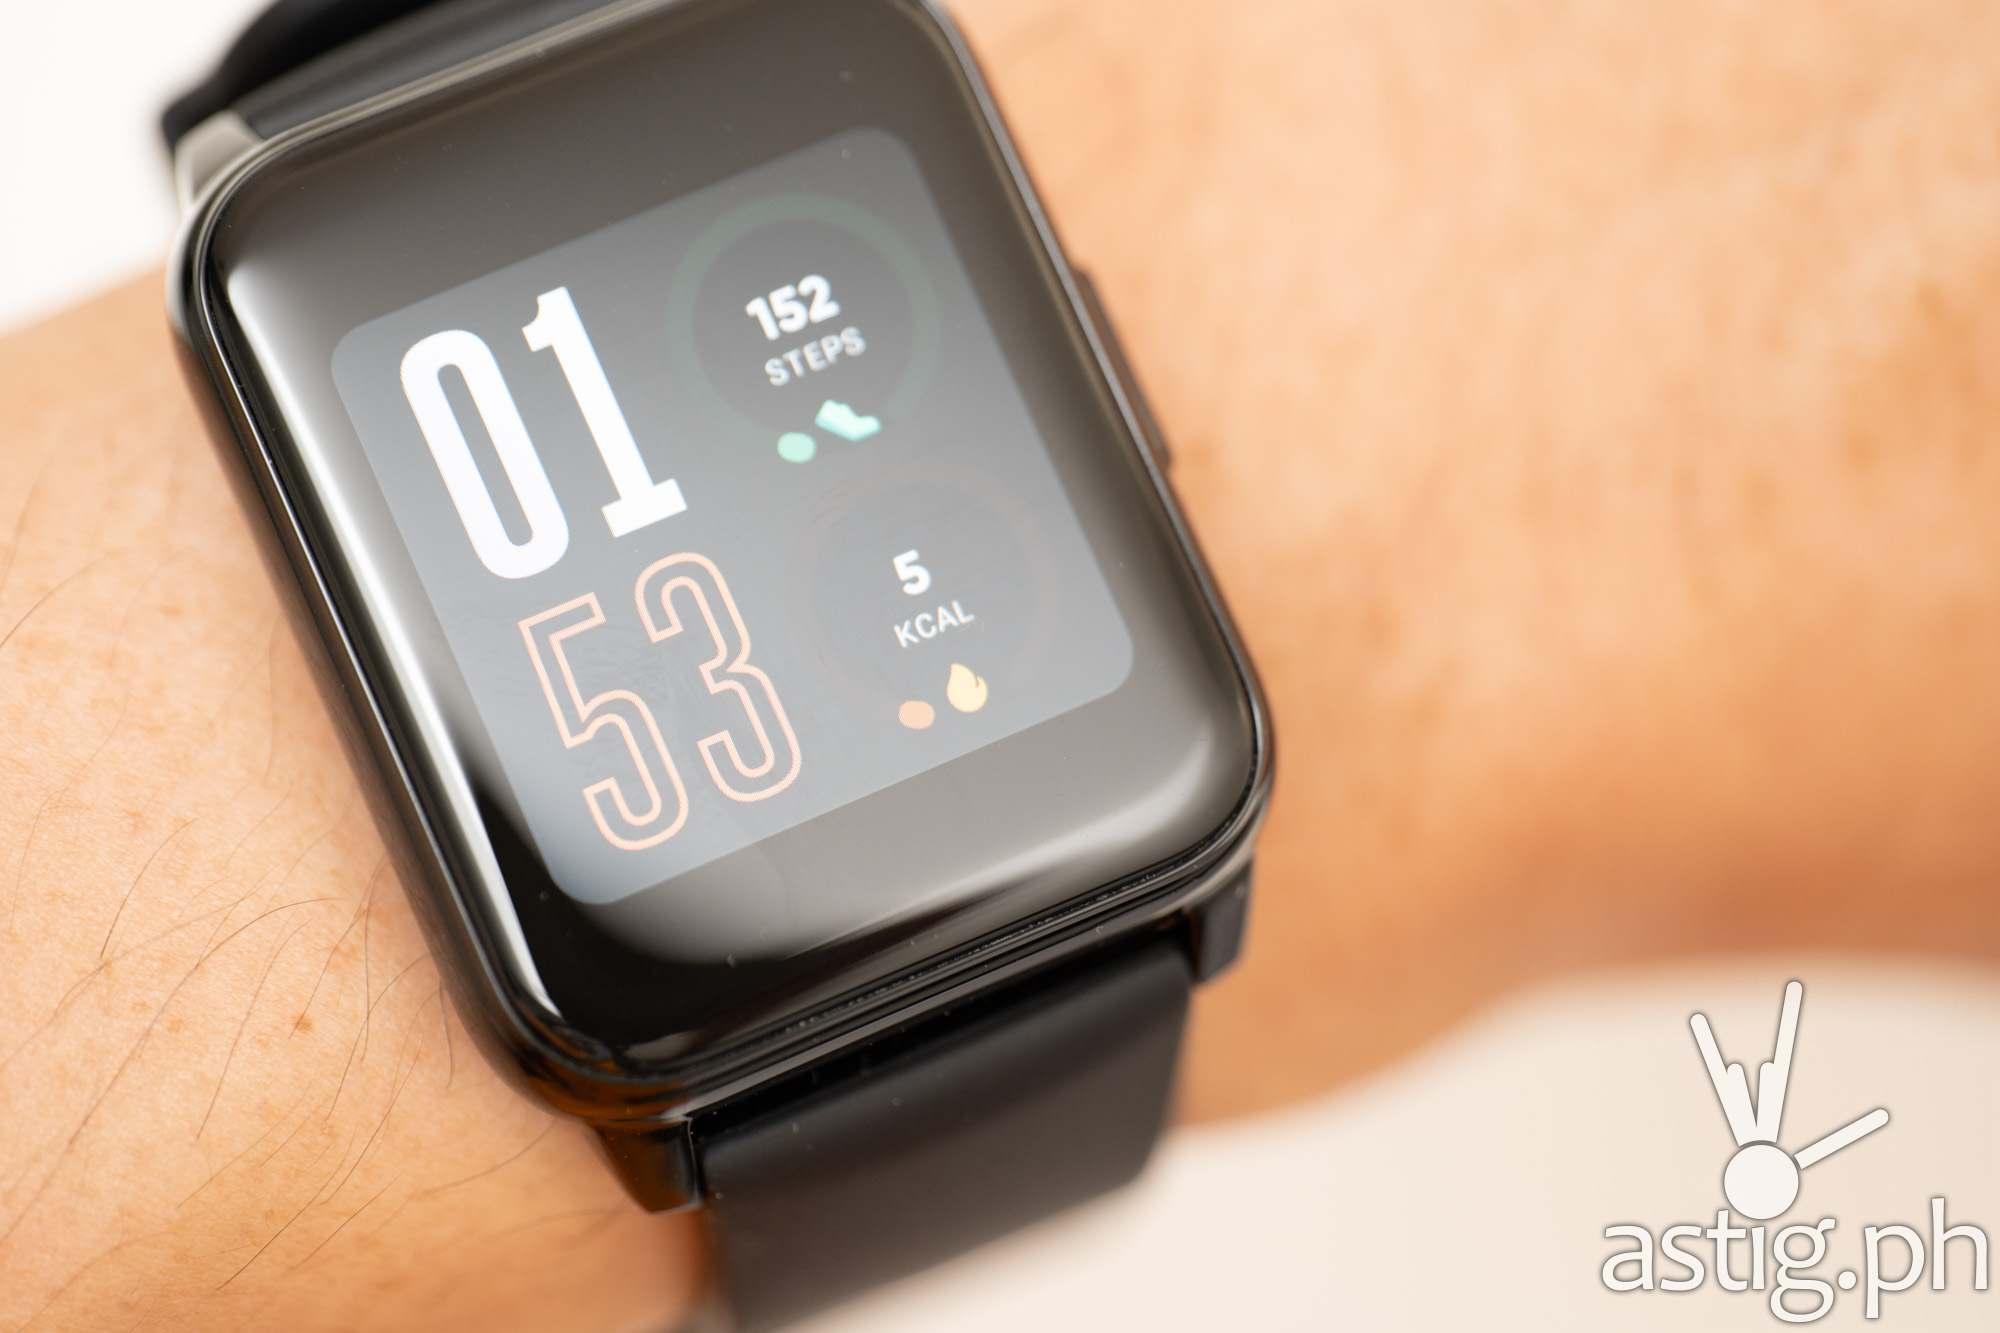 Wrist macro - realme Watch 2 (Philippines)